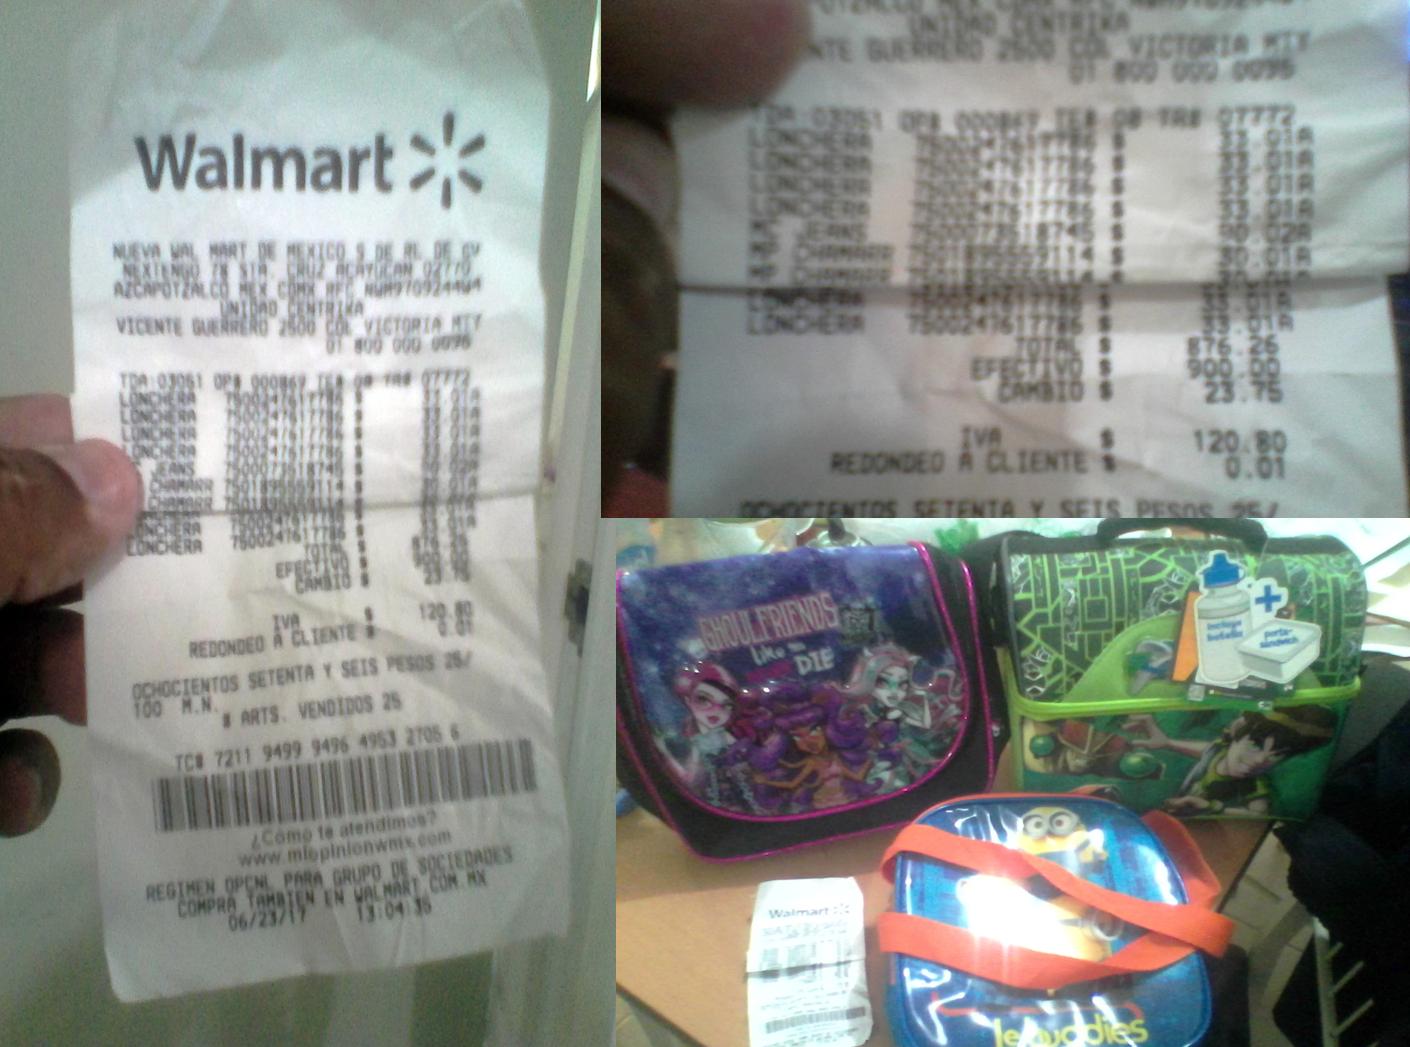 Walmart:  Lonchera Minions, Ben 10 y Monster high  $33.01 MAS PROMOCONSEJO – URGENTE Chamarra con TRAMPA.